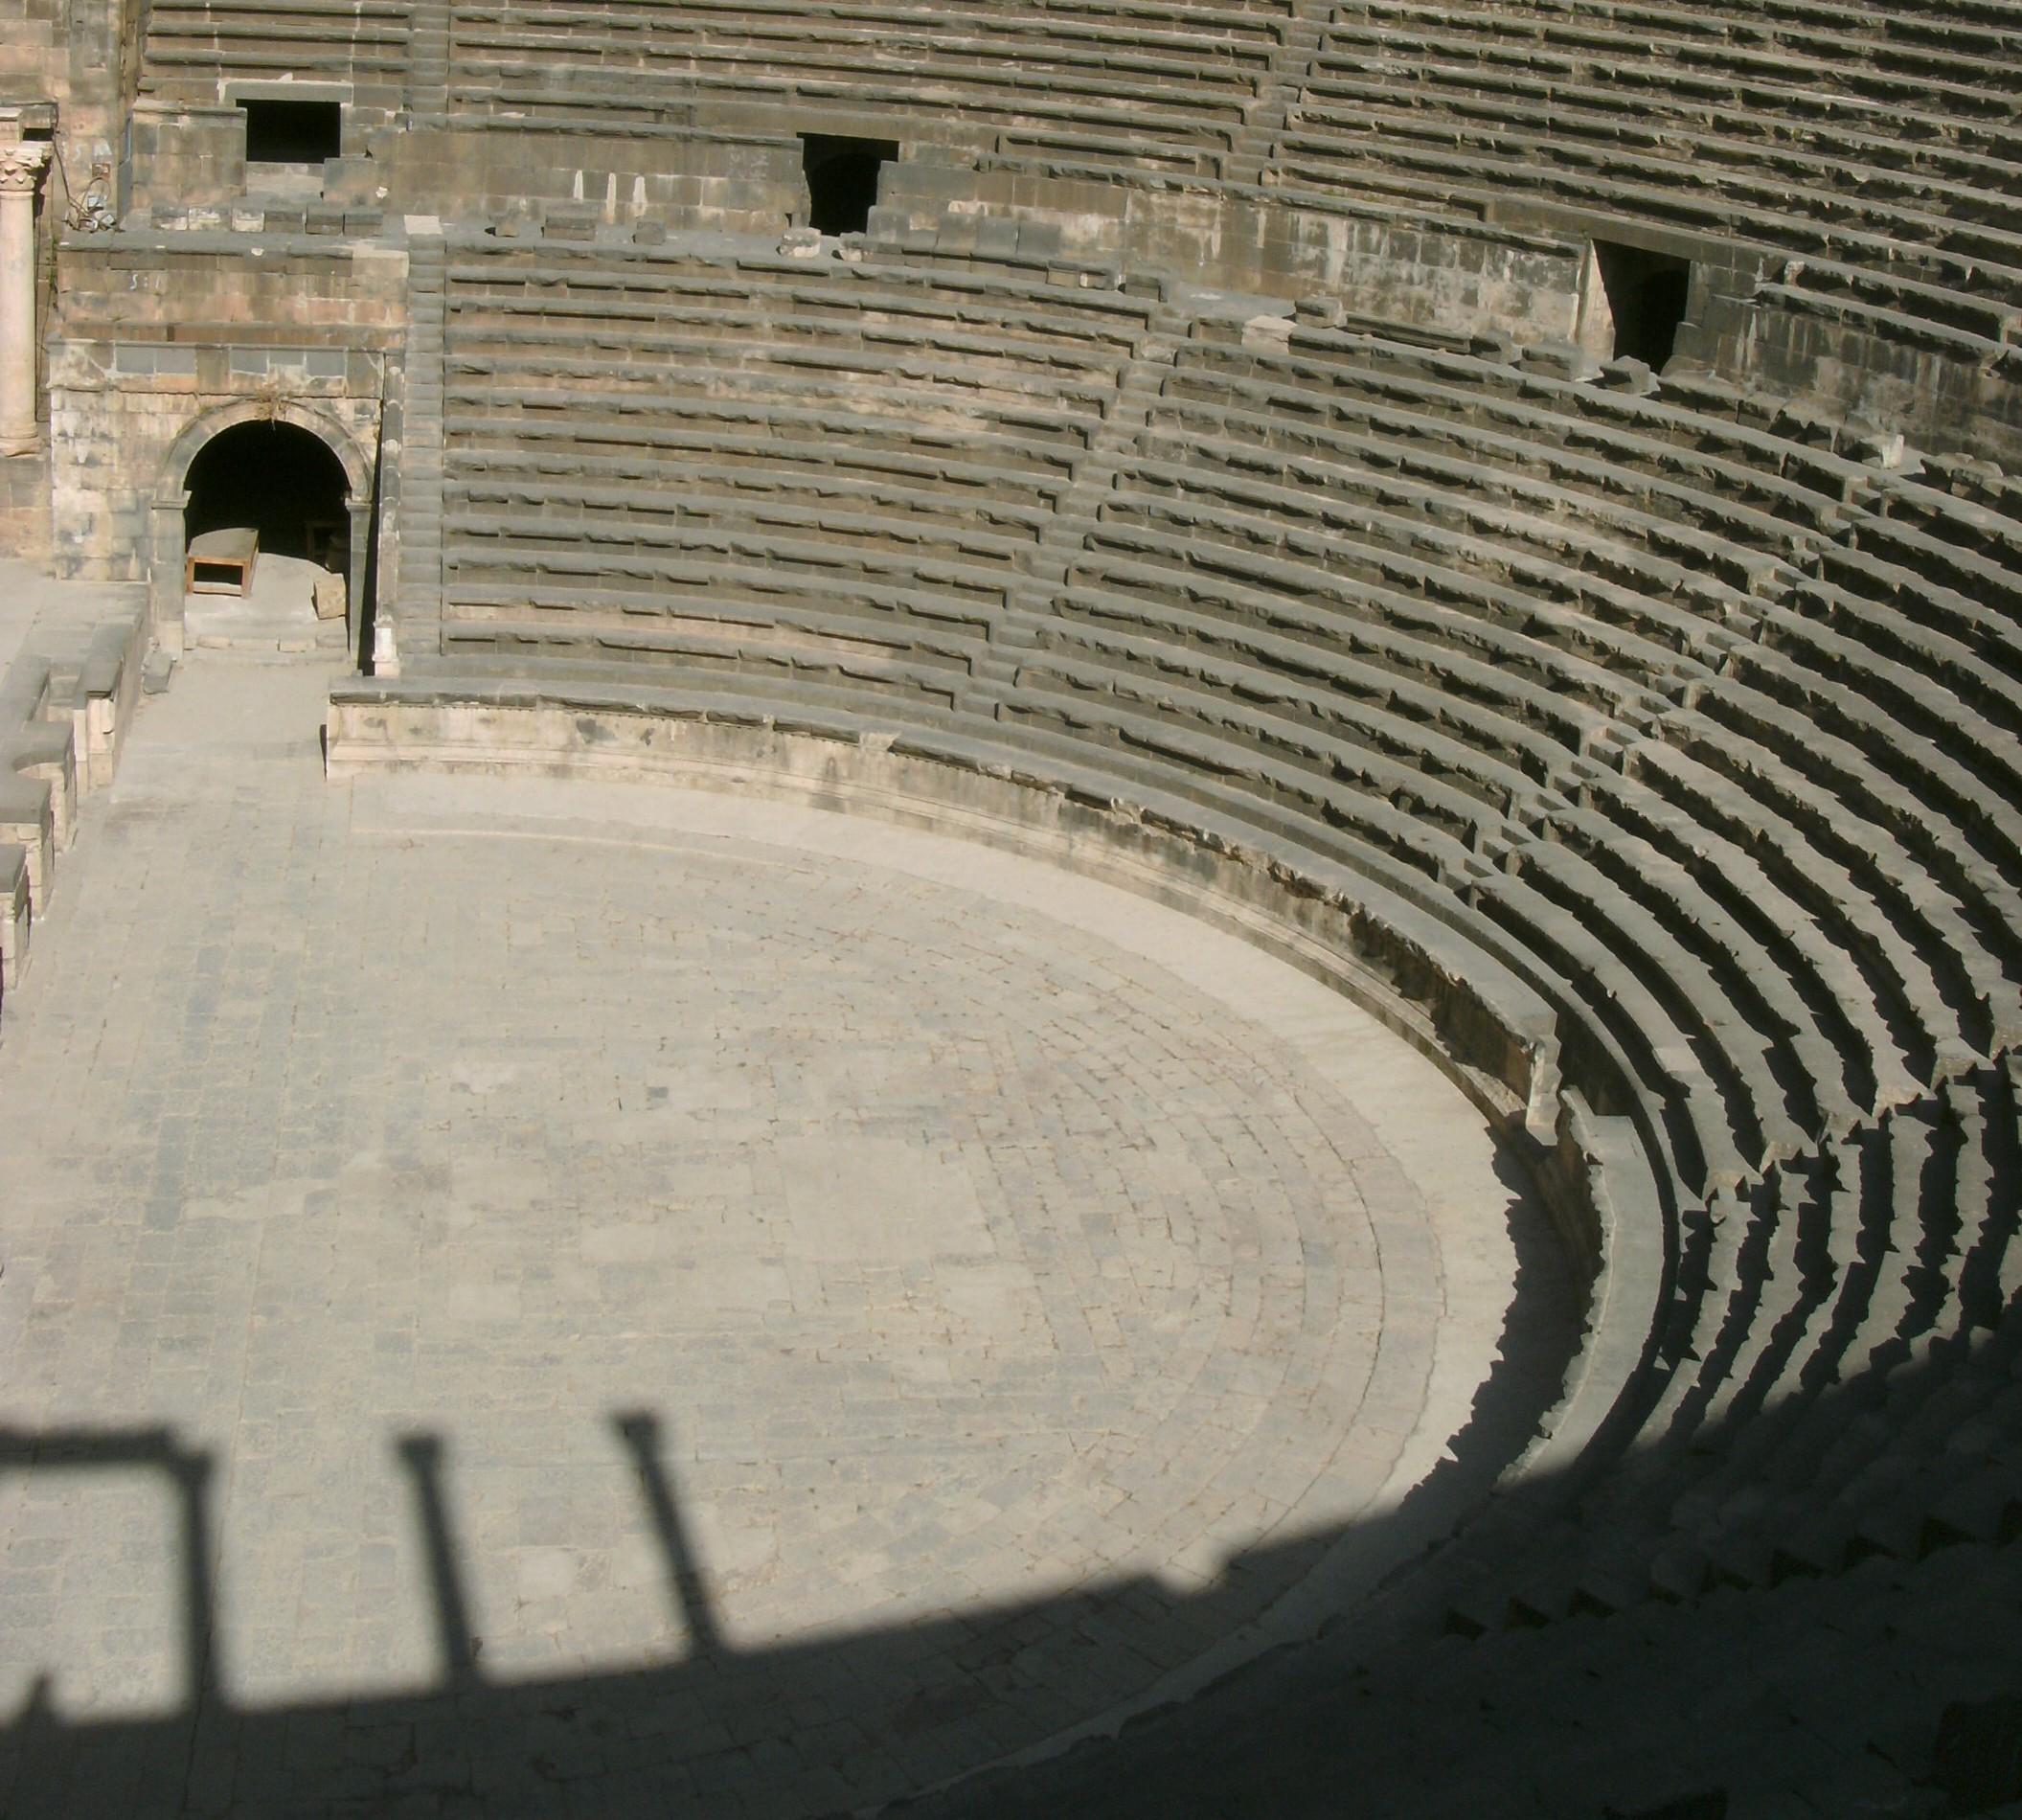 Roman amphitheatre at Bosra